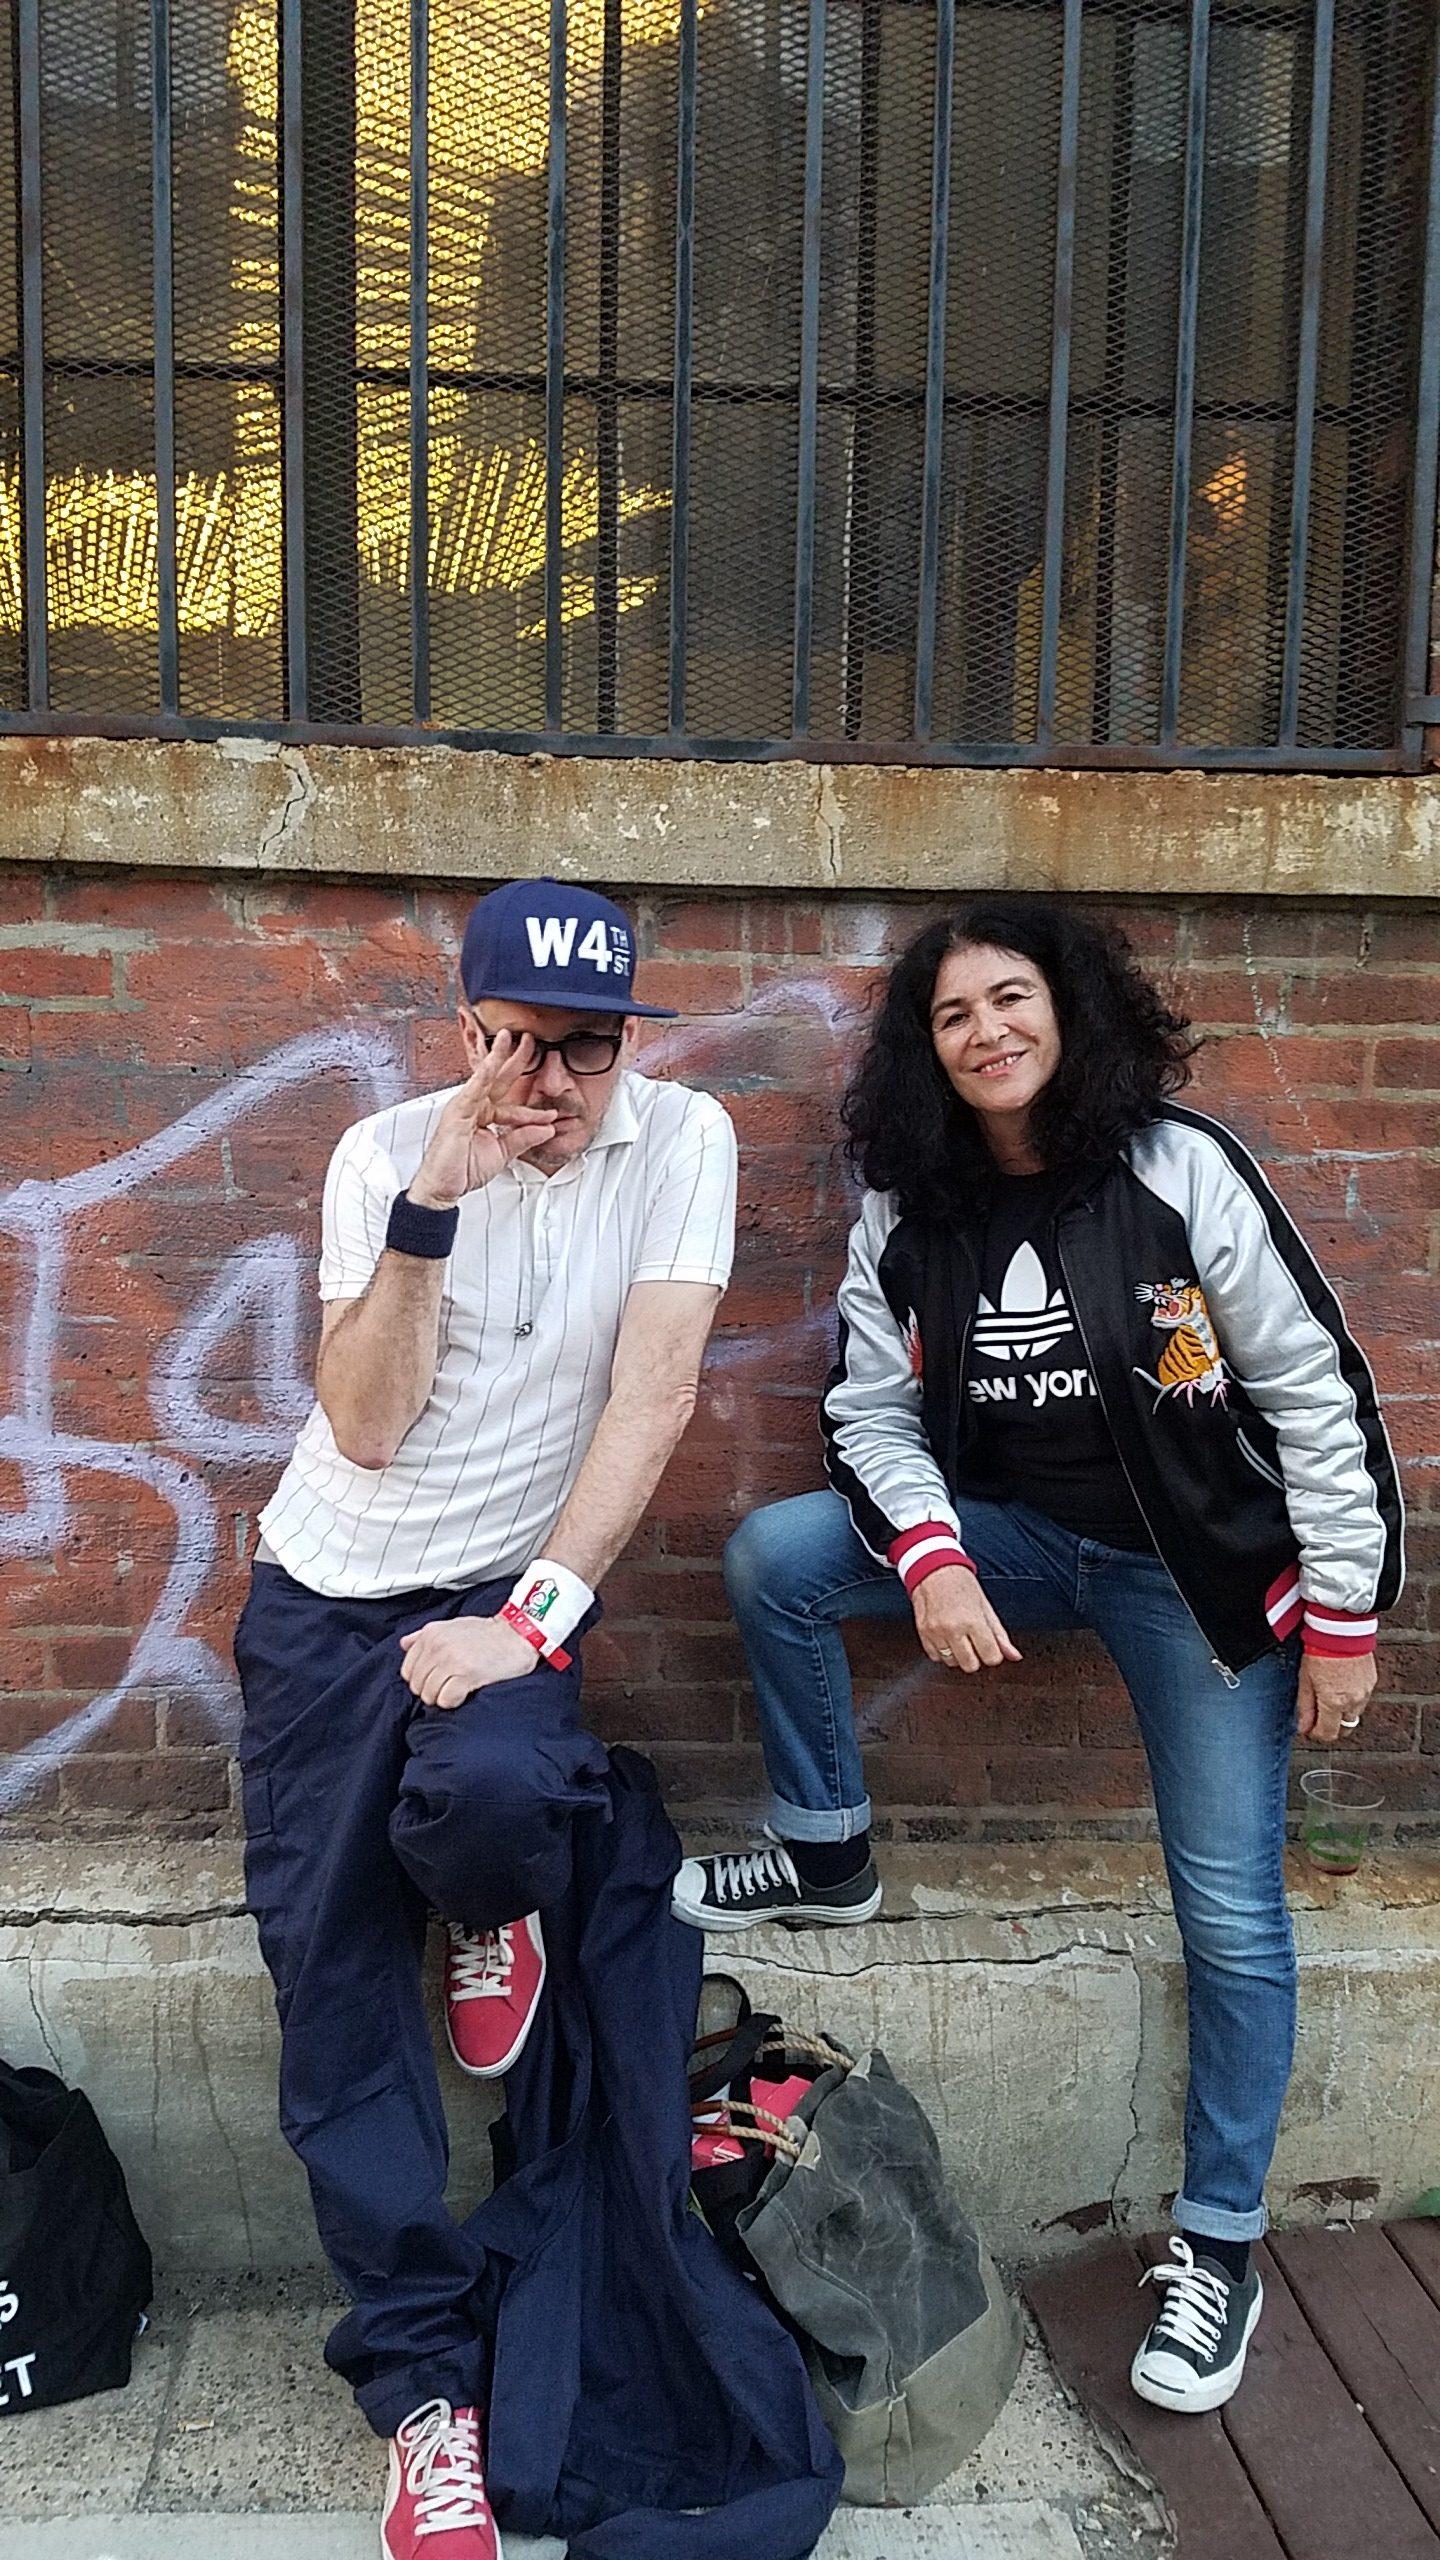 ricky-powell-janette-beckman-1xrun-murals-in-the-market-20160915_194022_001